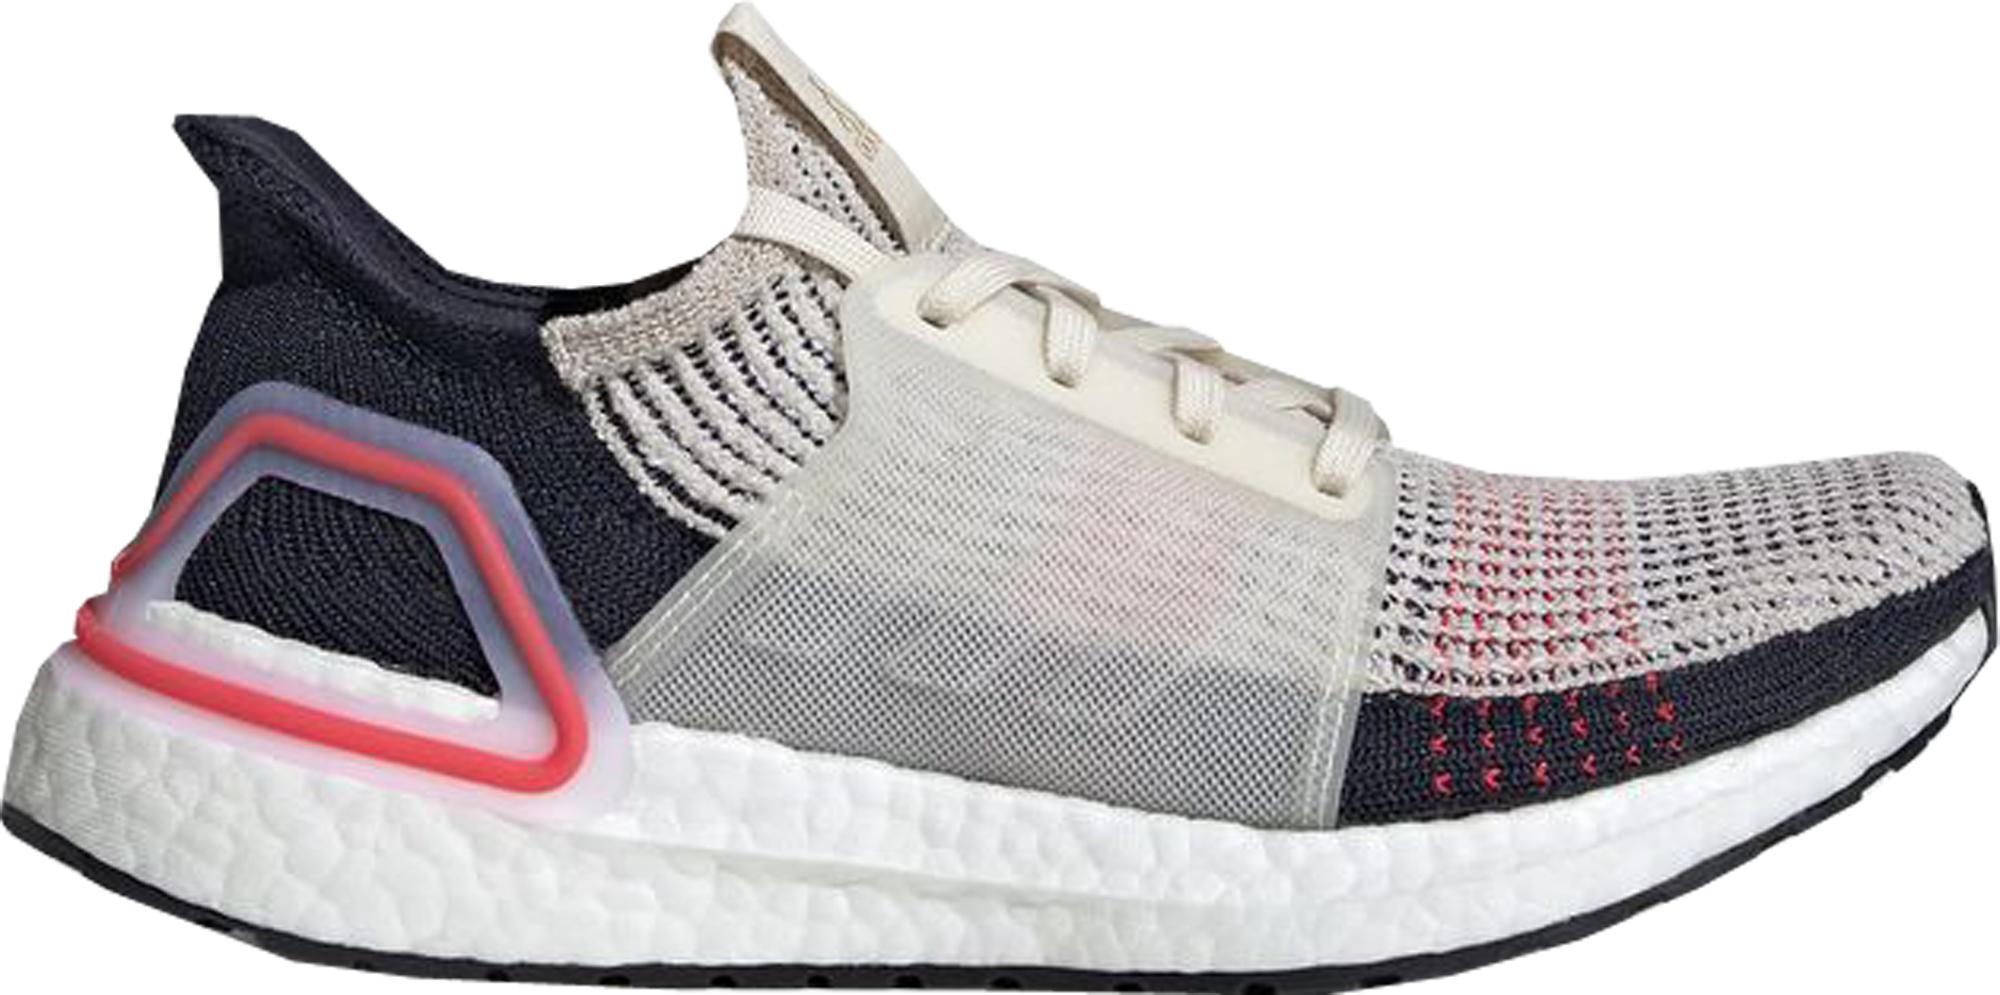 adidas Ultra Boost 2019 Clear Brown Chalk White (W)